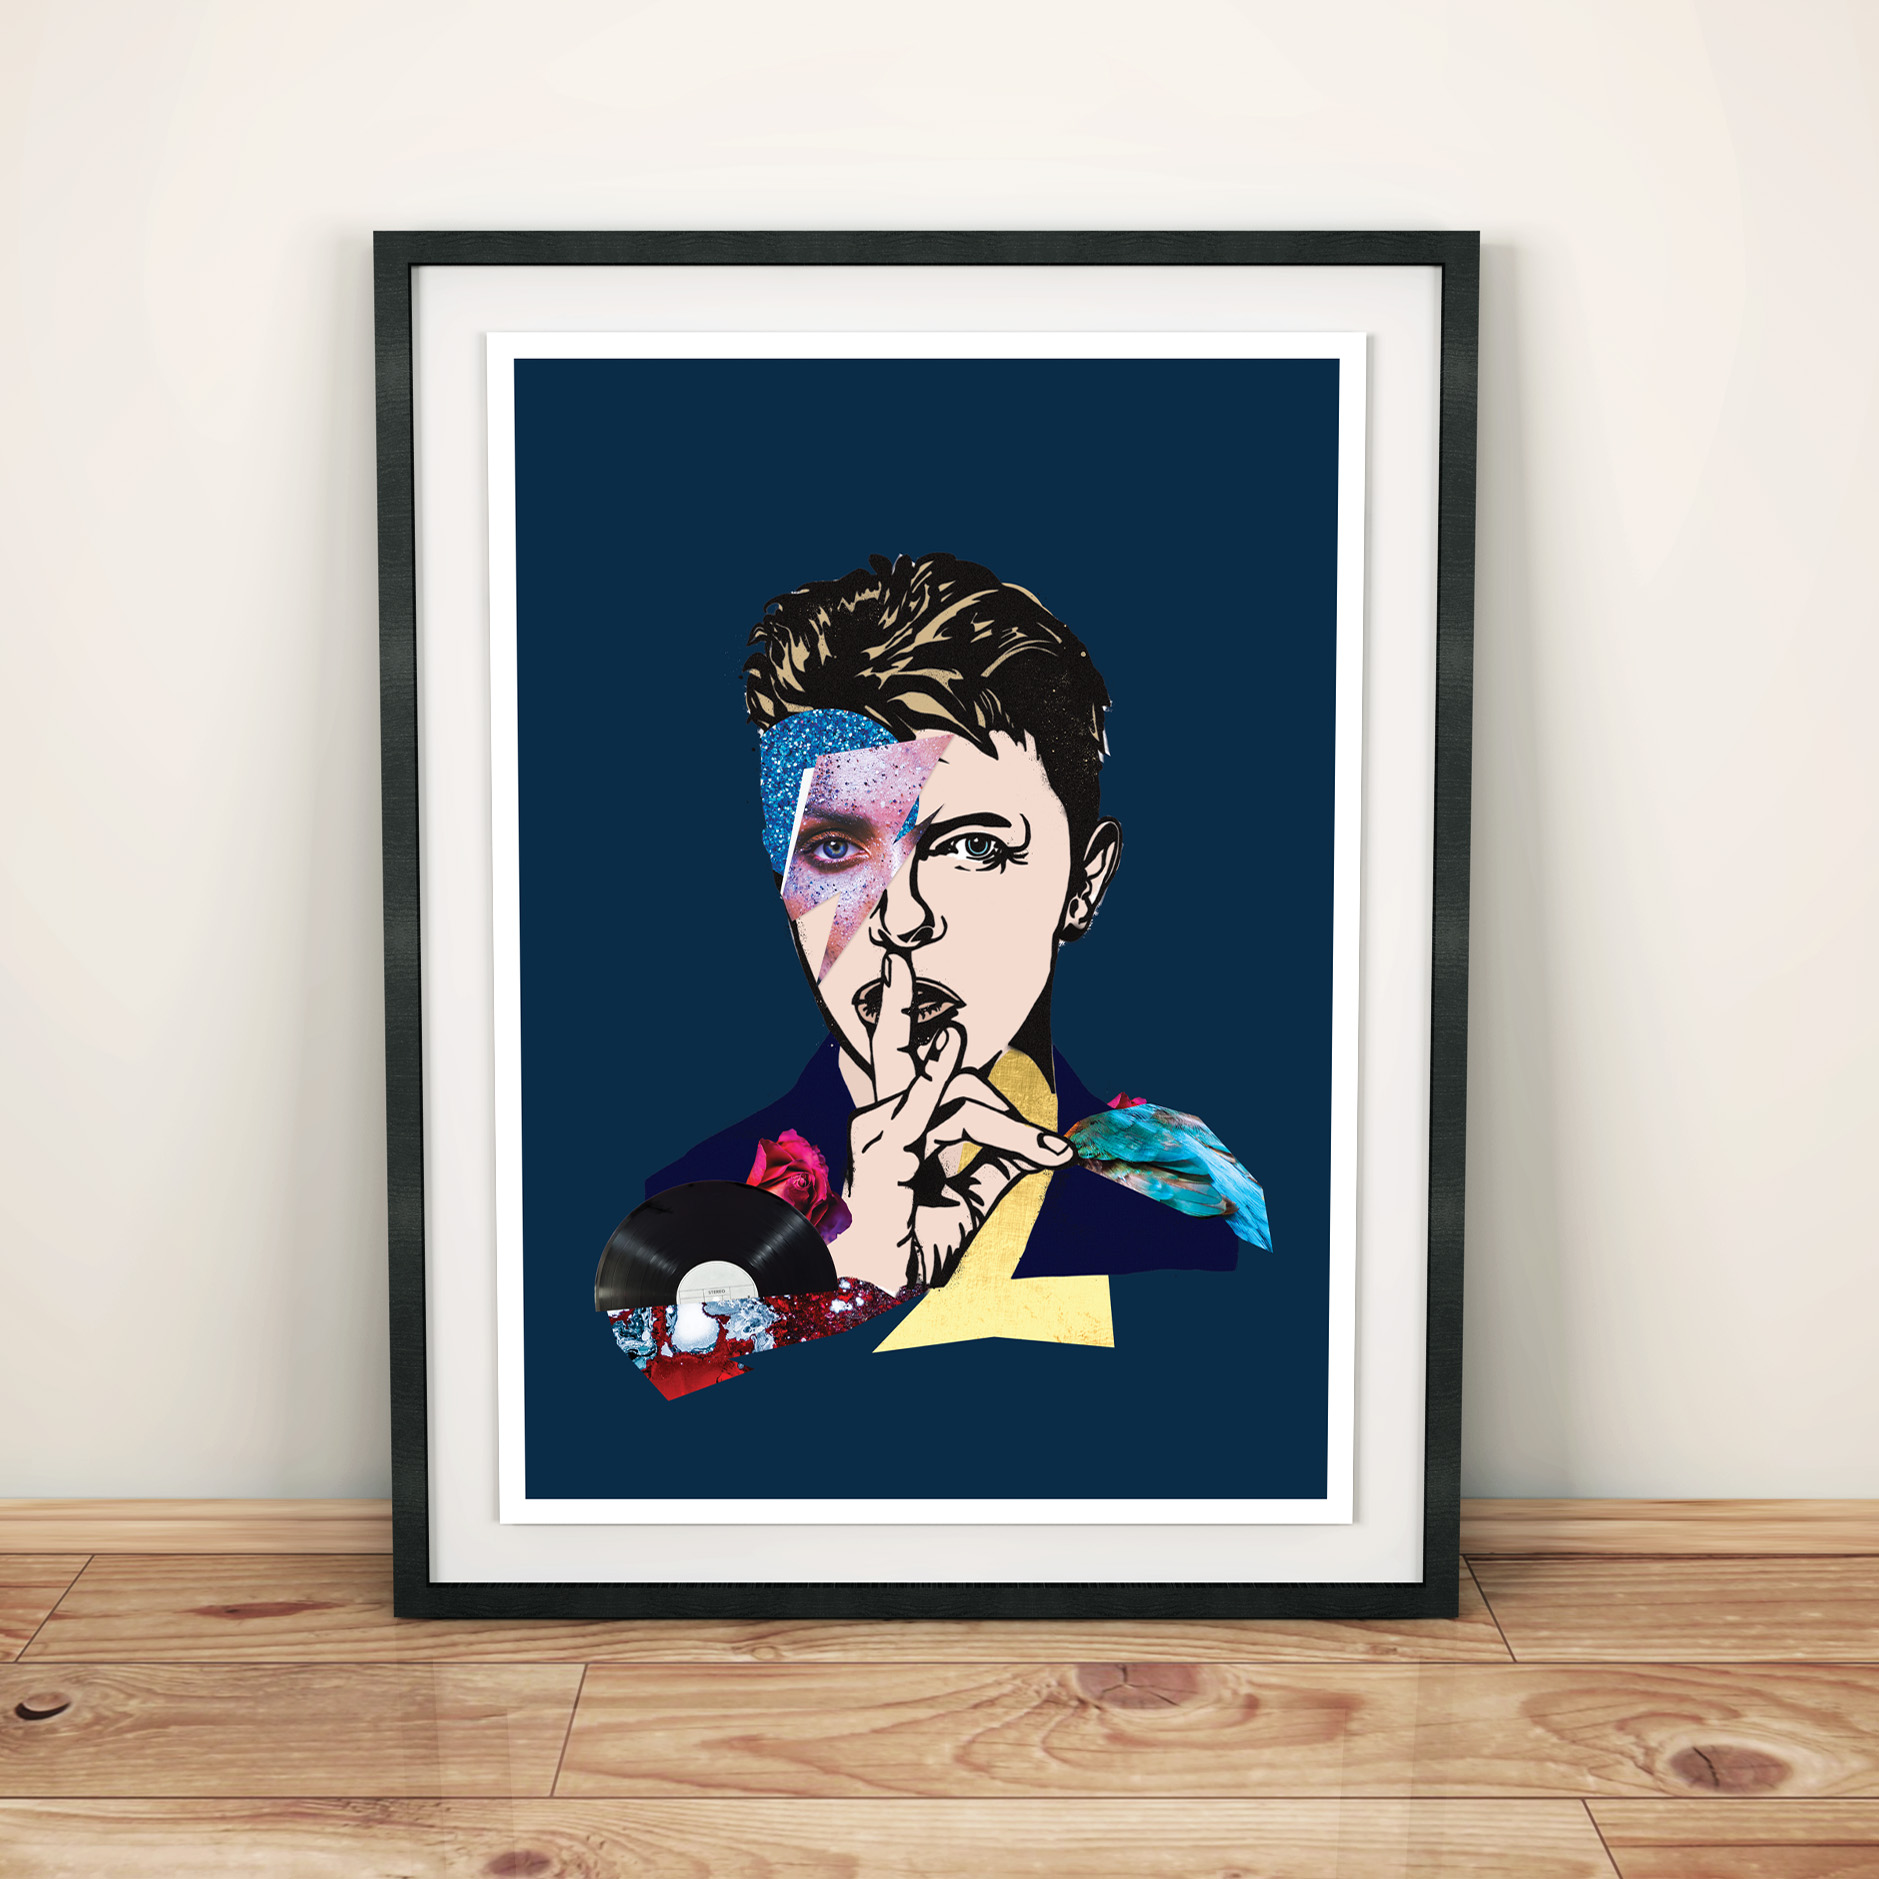 Neon-Pear-Inchcolm-Artwork-Bowie.jpg